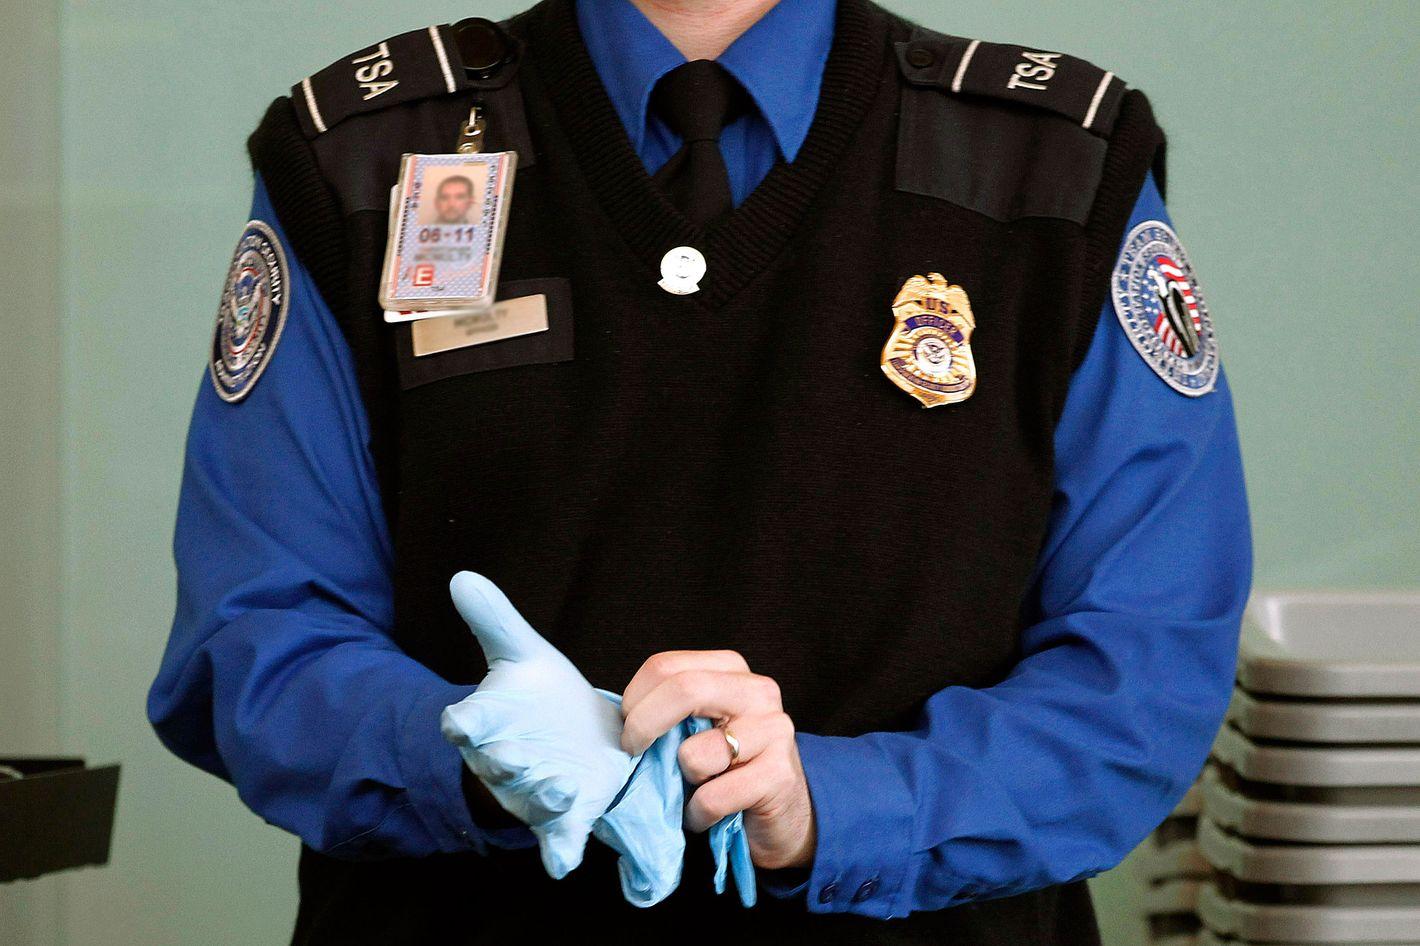 Assault Arrested For Alleged La Agent At Tsa Guardia Sexual